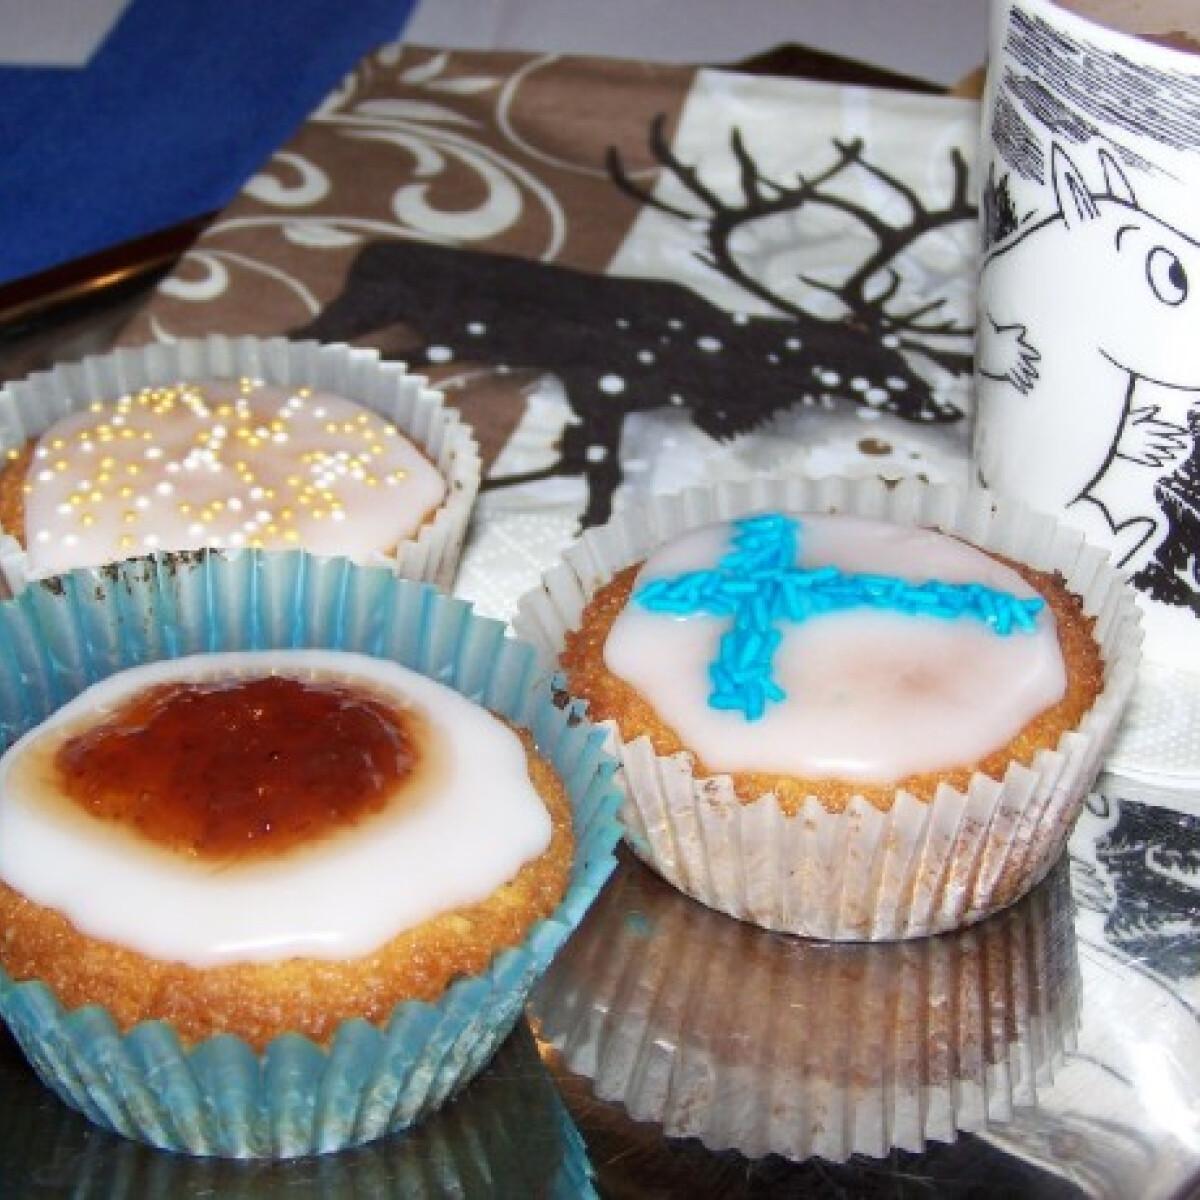 Runebergintorttu vagy Runeberg muffin